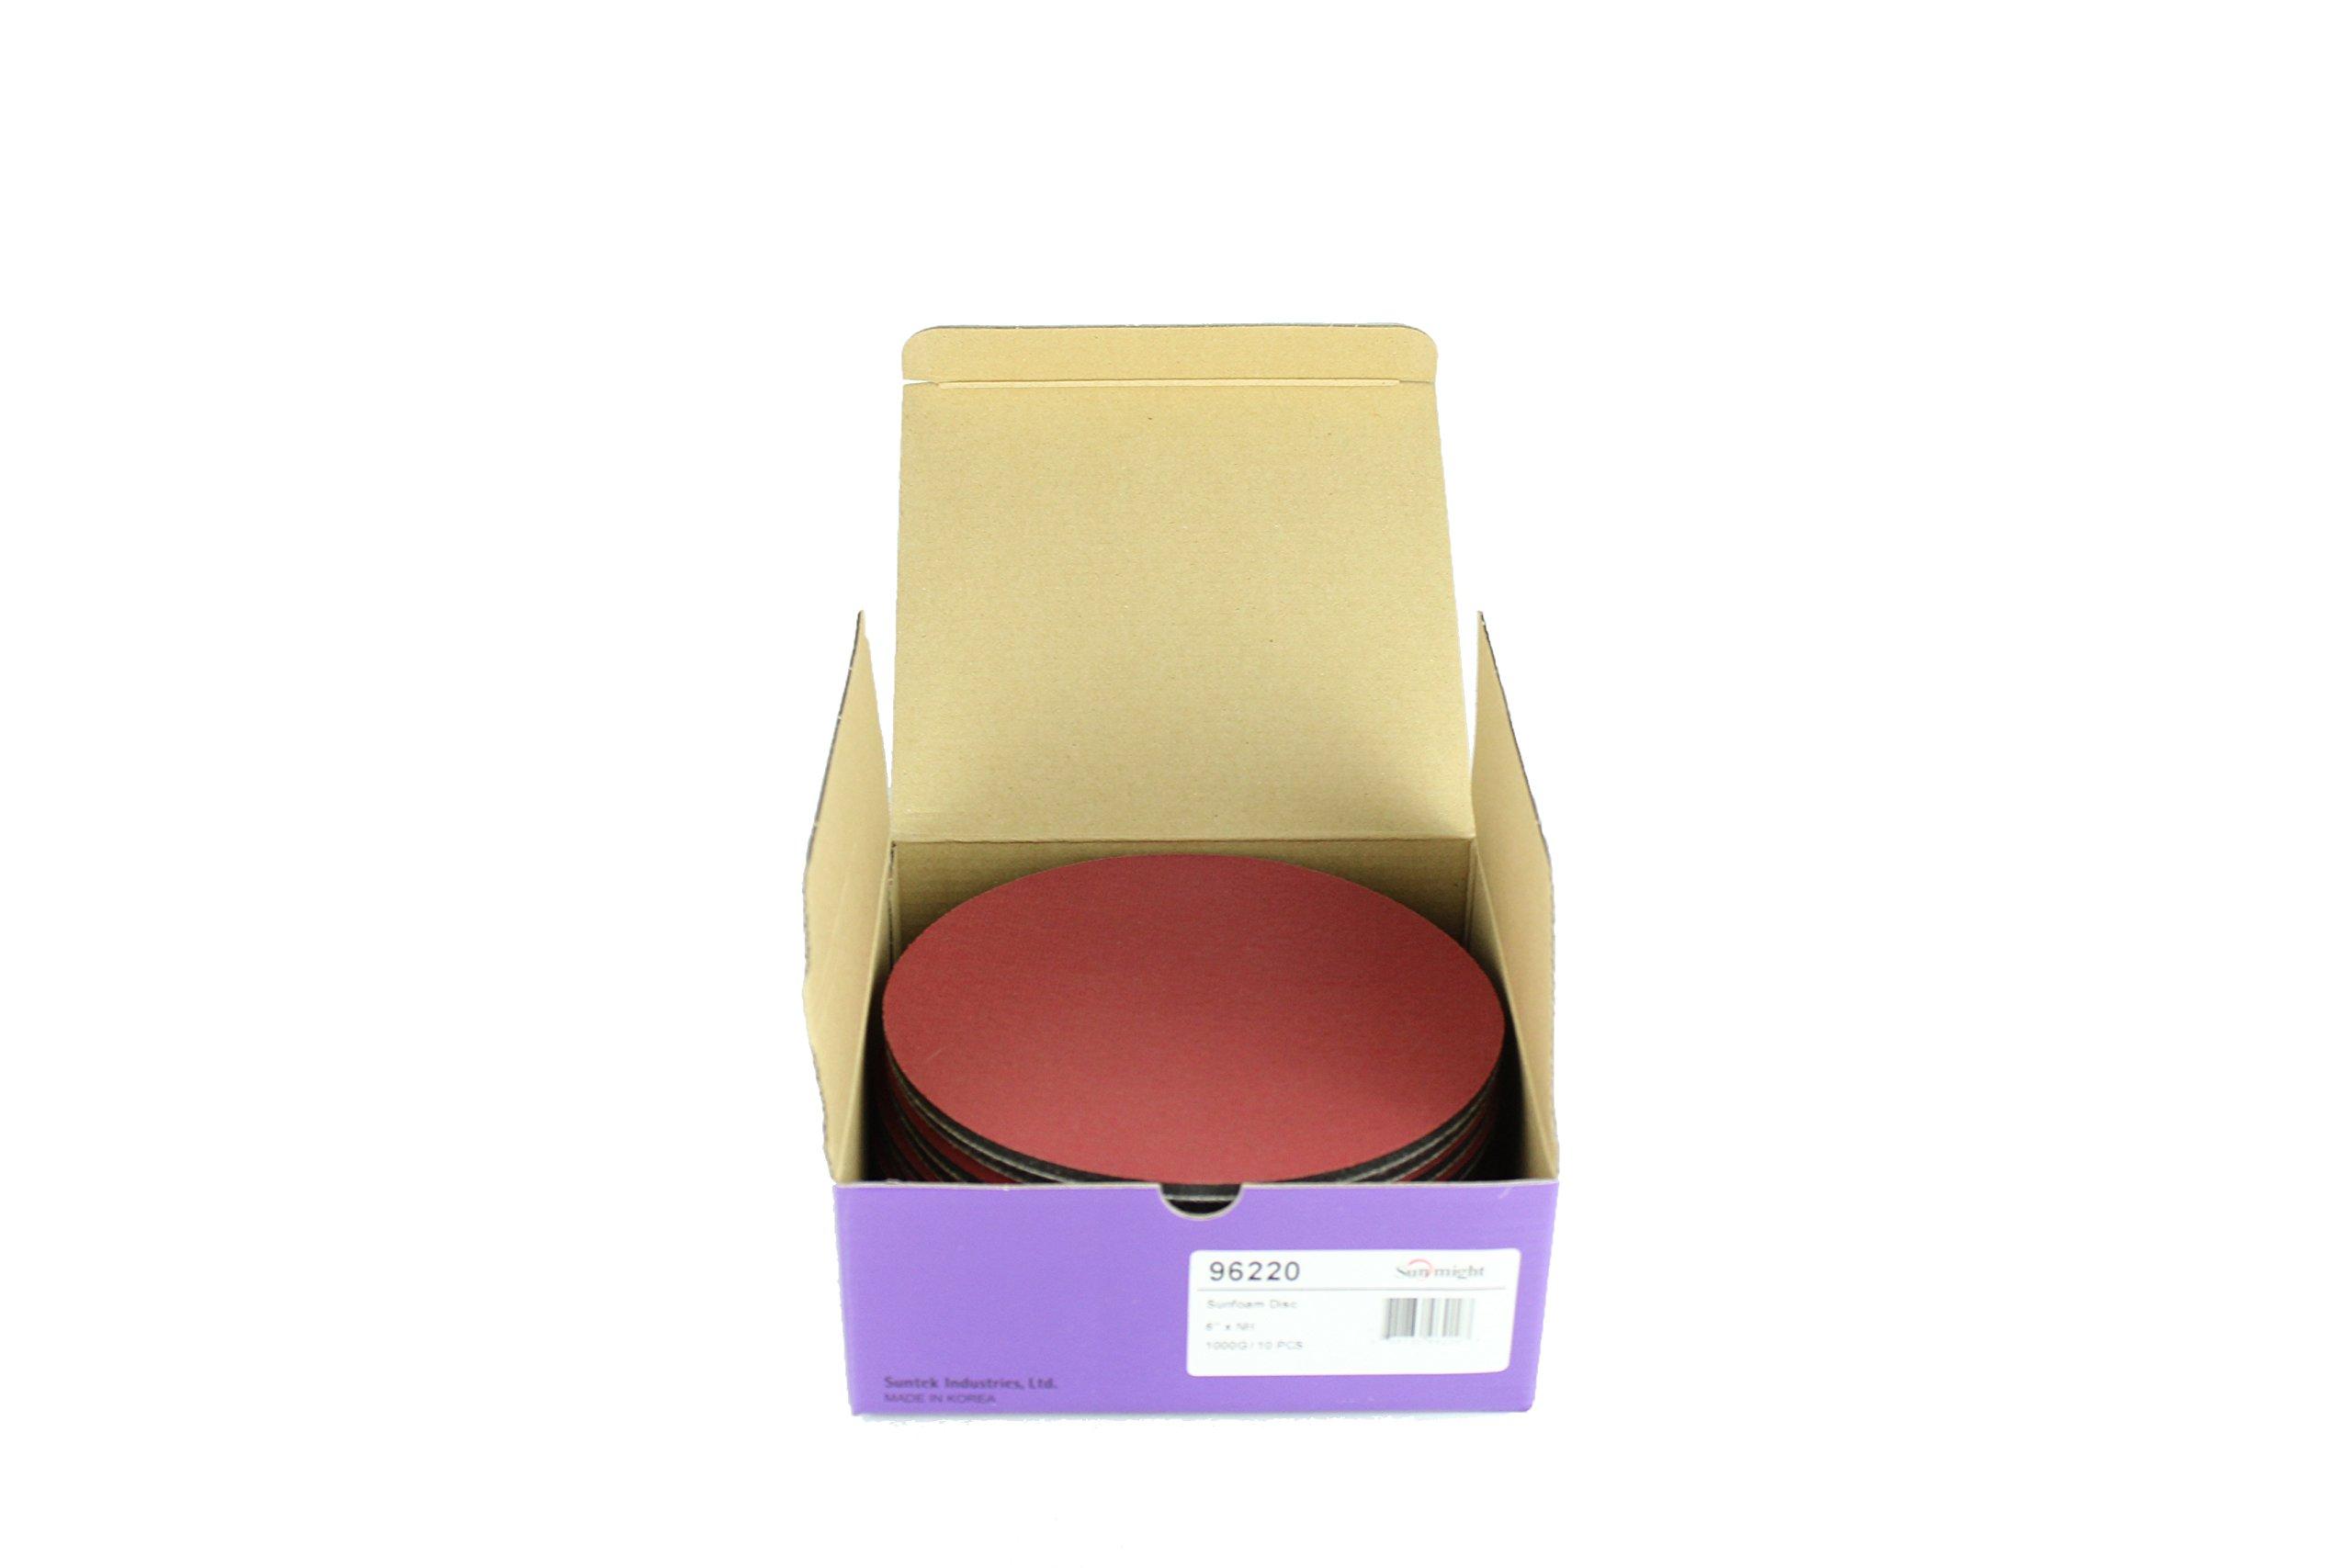 Sunmight 96220 1 Pack 6'' No Hole Velcro Foam Disc (Sunfoam Grit 1000) by Sunmight (Image #3)